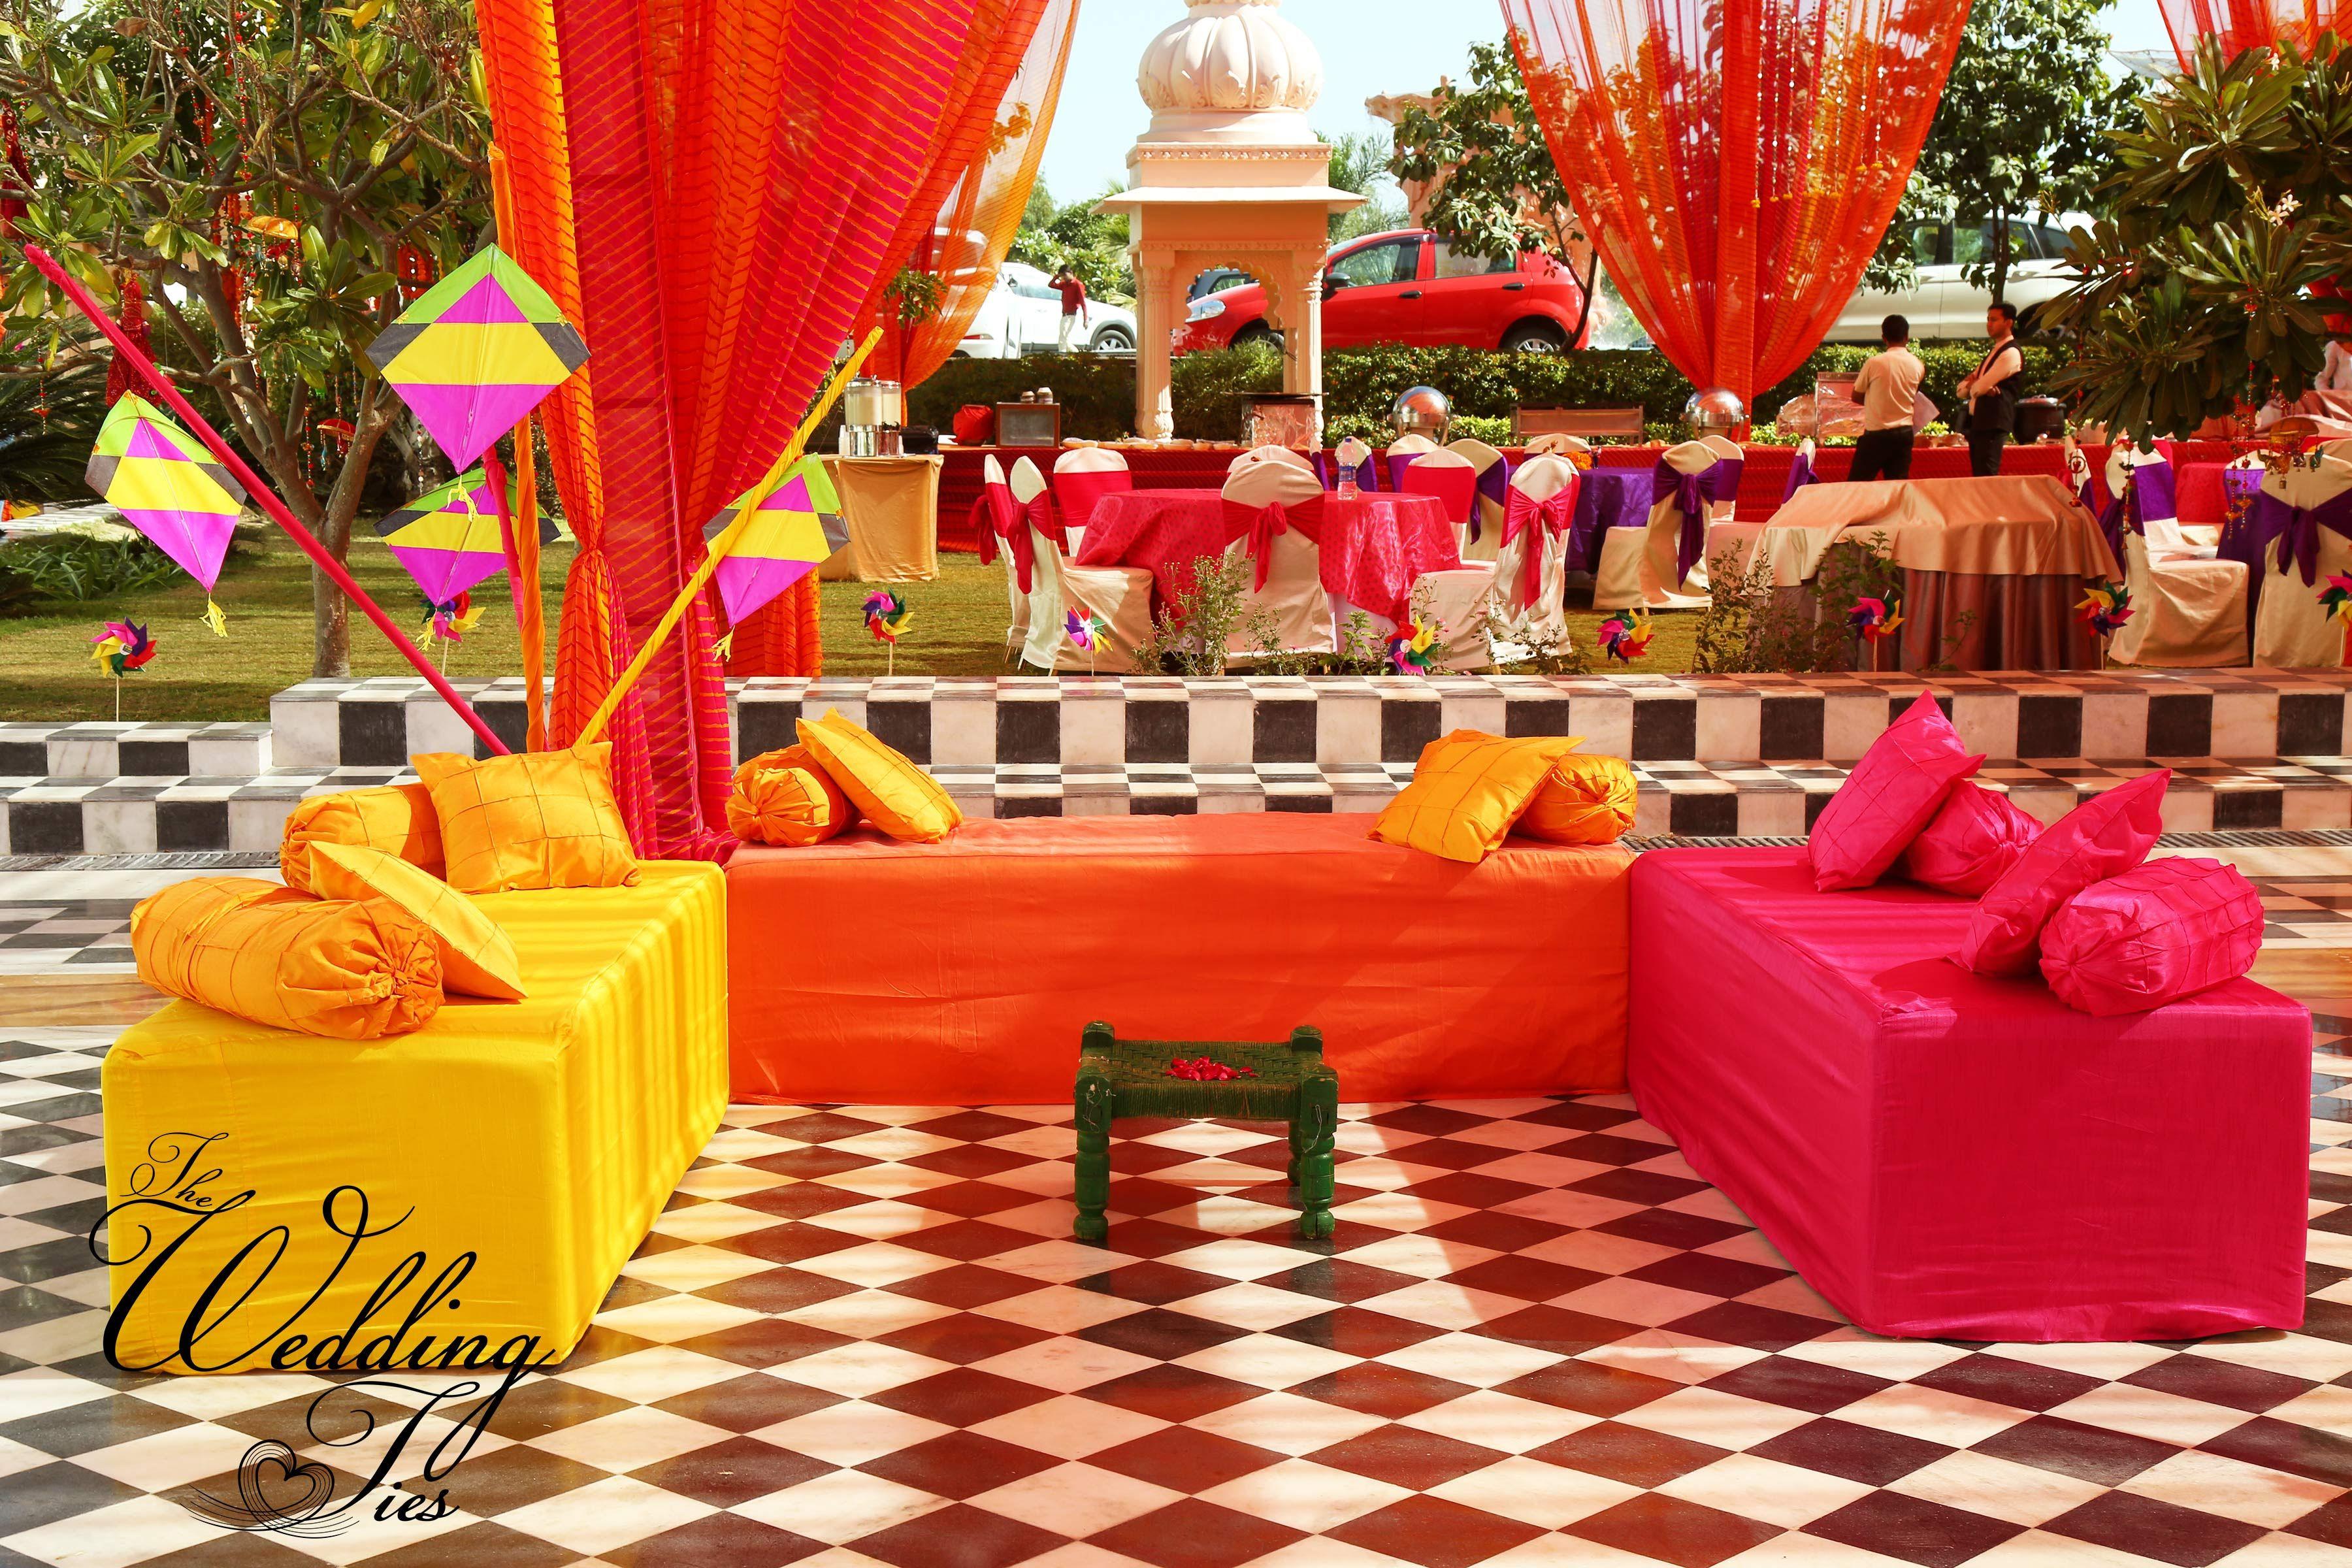 Destination Wedding Planners and wedding decorators in